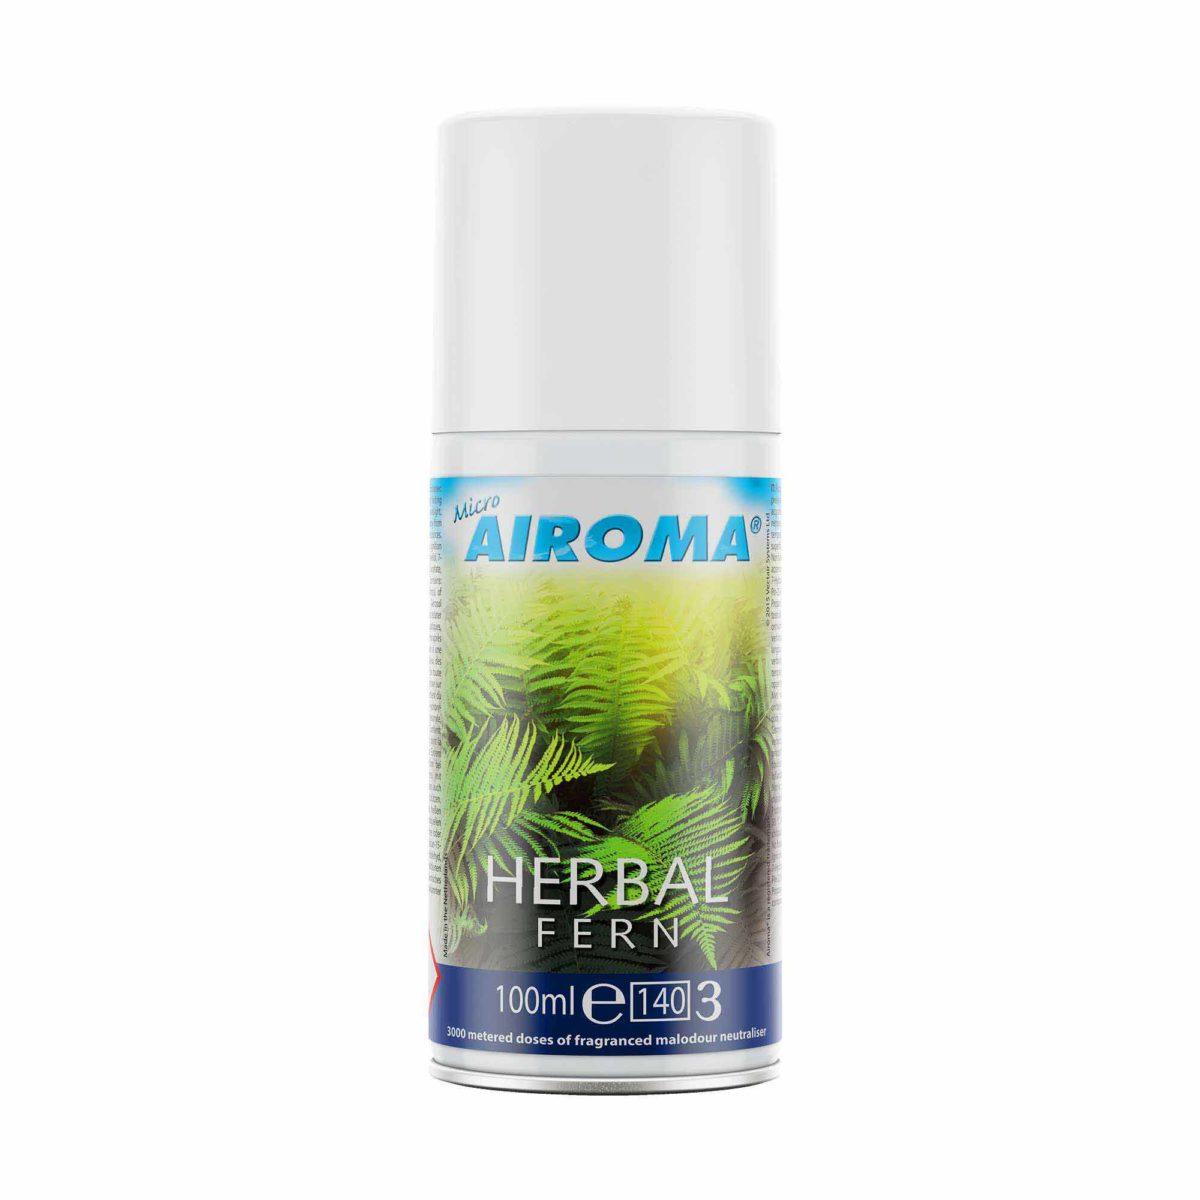 Vectair Micro Airoma lõhn Herbal Fern, 100 ml, kastis 12tk, LÕPUMÜÜK